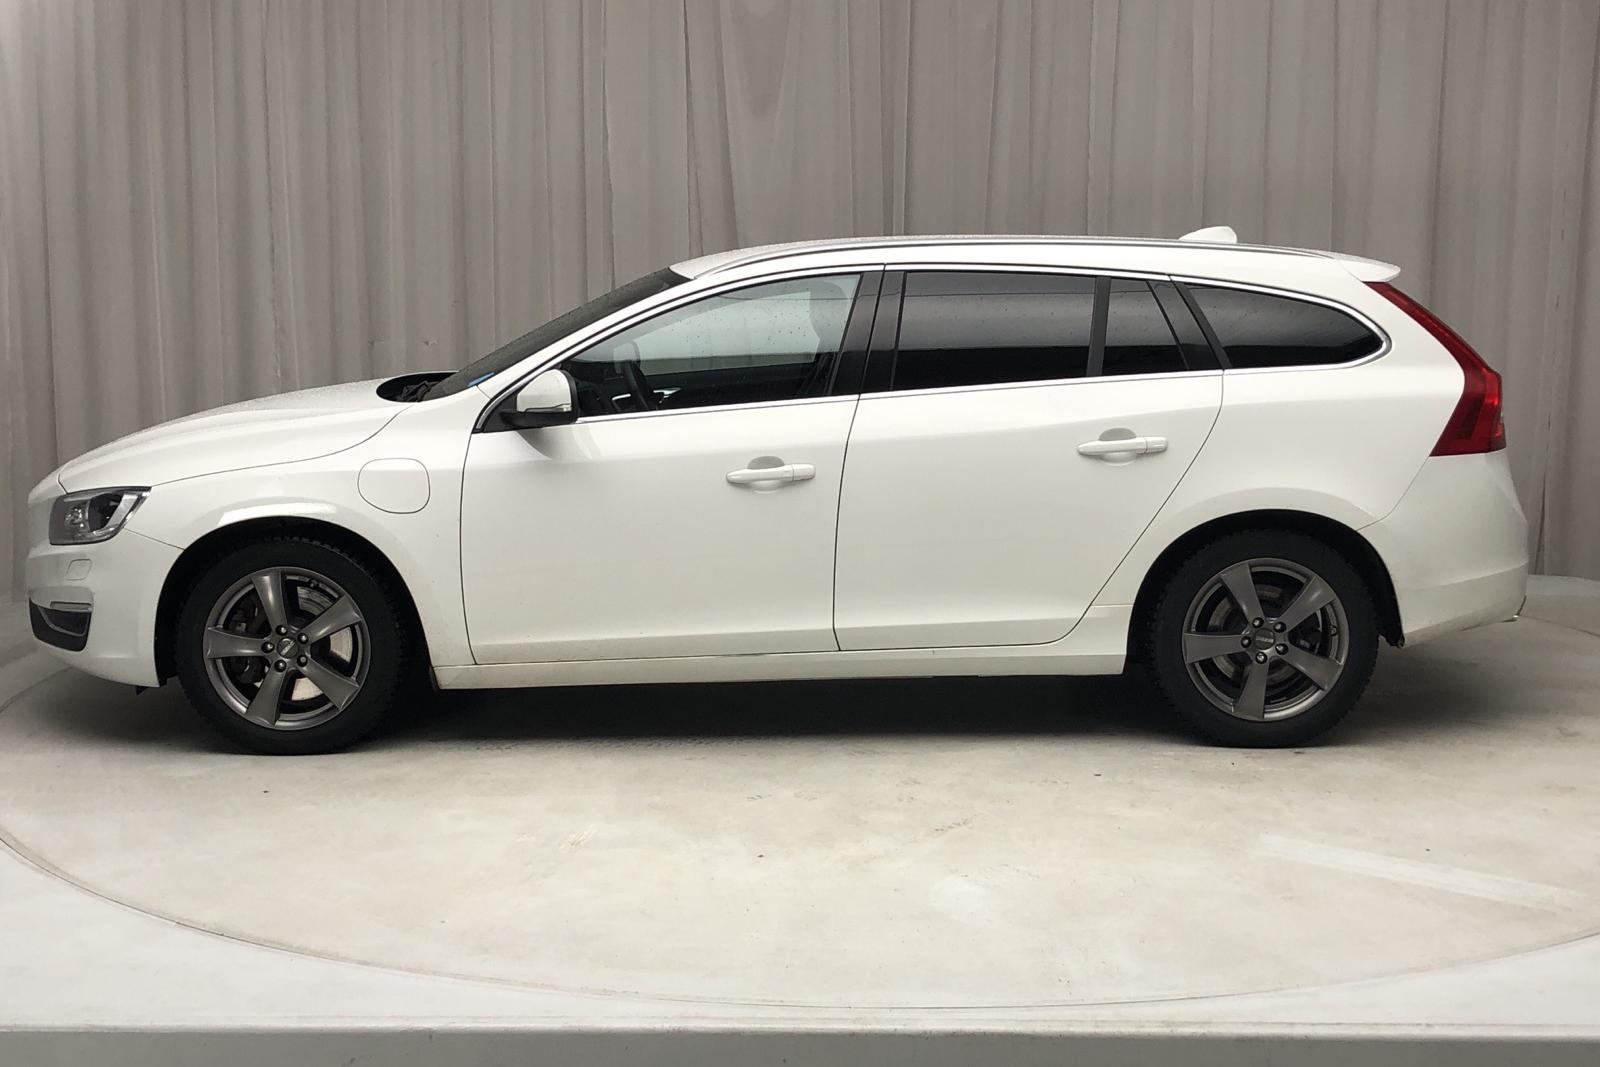 Volvo V60 D5 AWD Twin Engine (163hk) - 125 270 km - Automatic - white - 2018